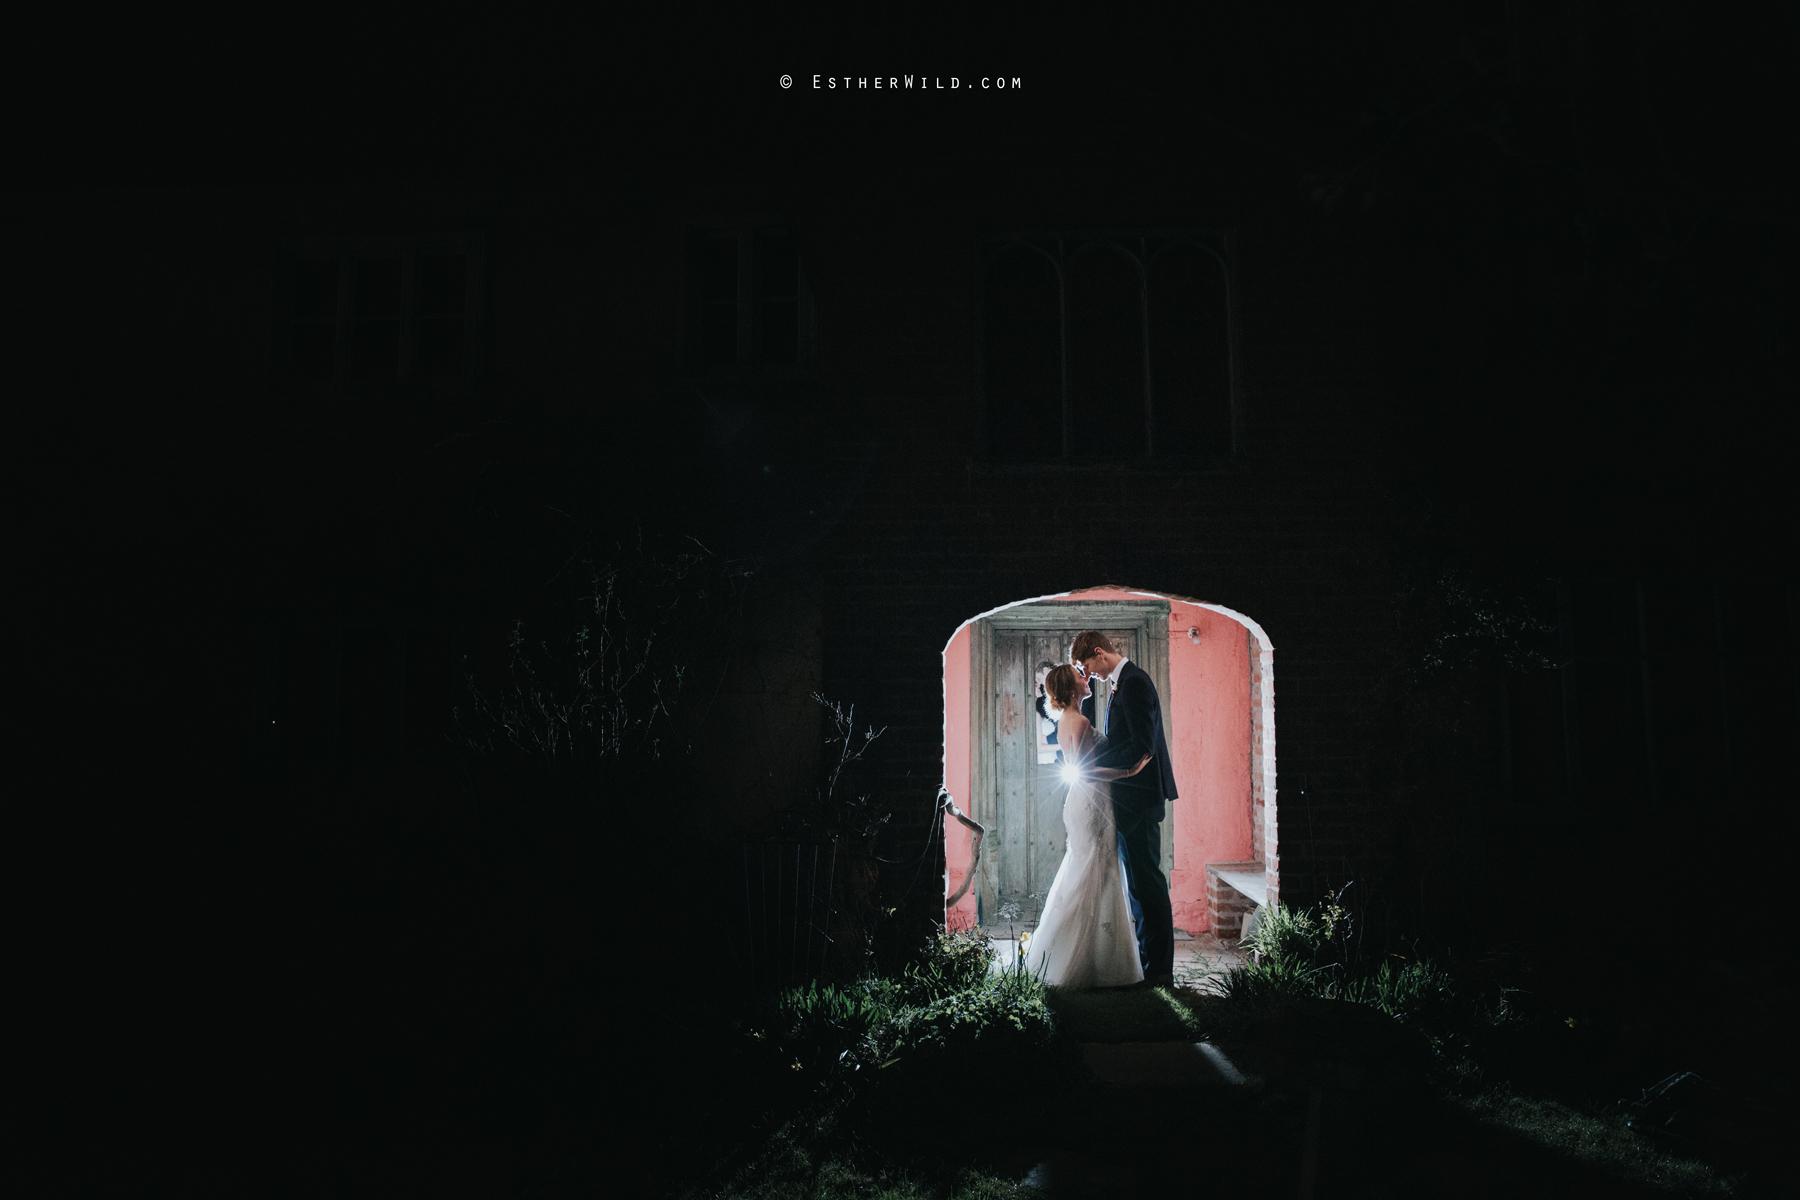 Glebe_Farm_Barn_Rustic_Norfolk_Wedding_Esther_Wild_Photographer_Copyright_IMG_3321.jpg